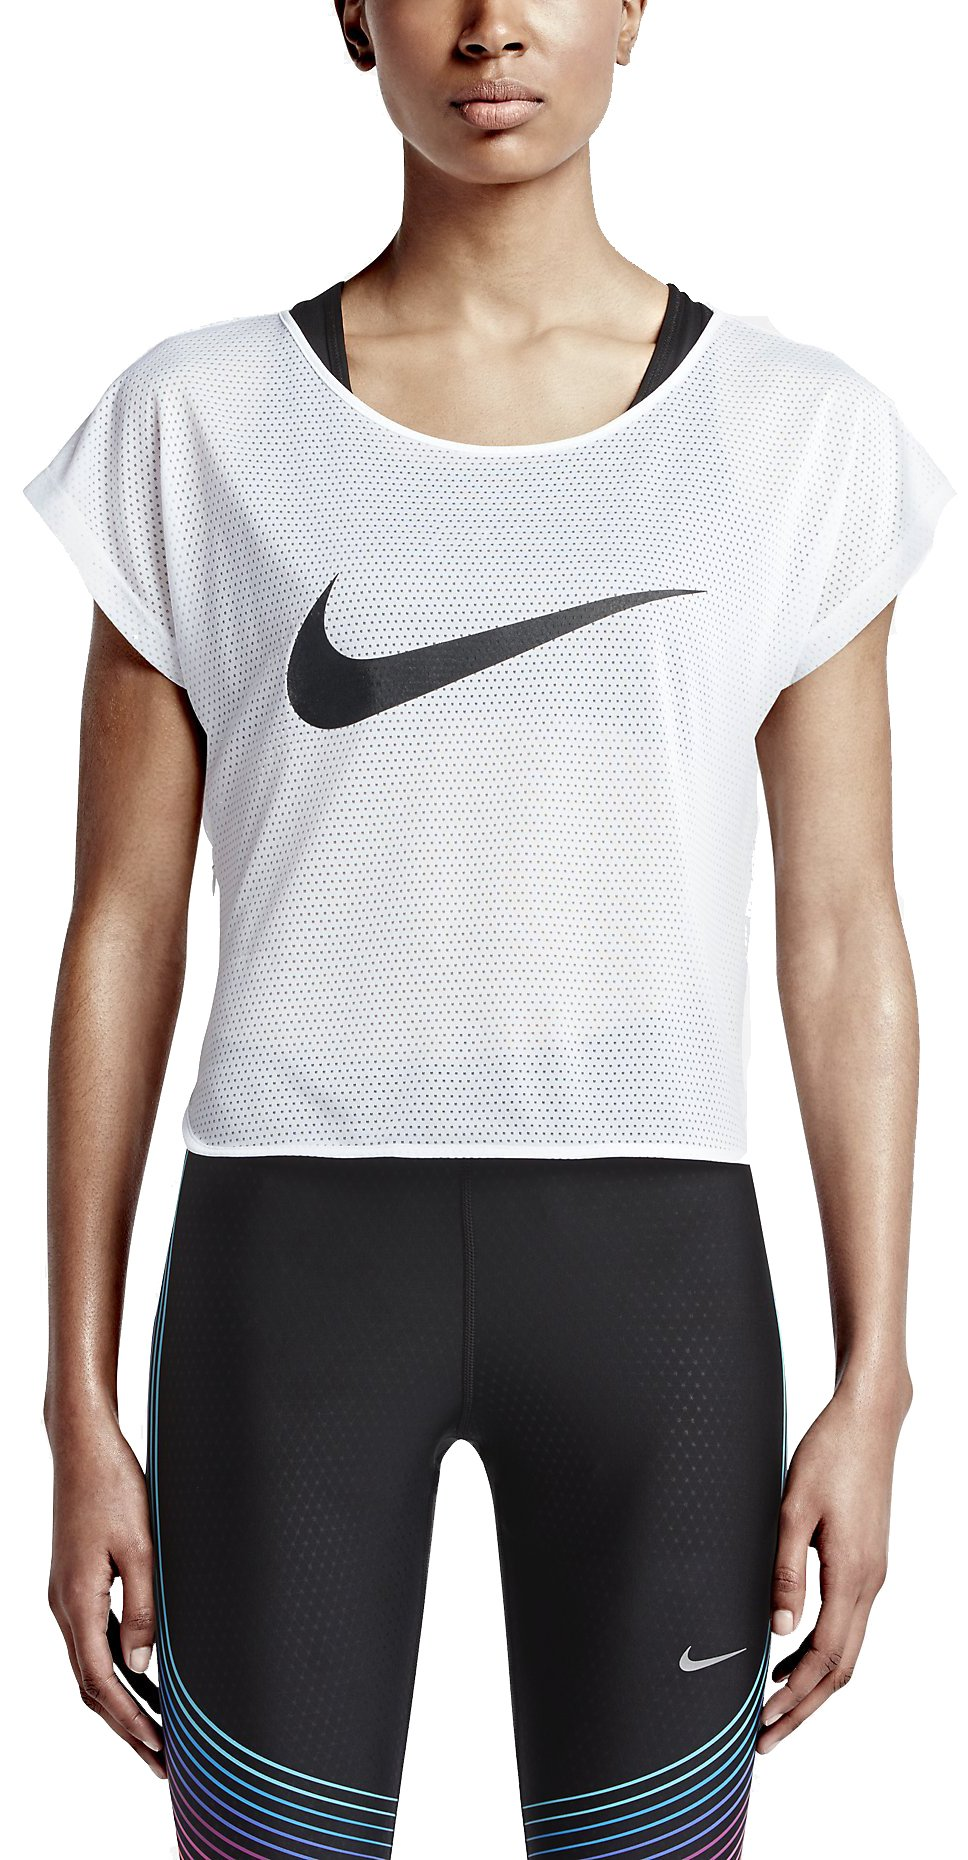 Běžecký top Nike City Cool Swoosh